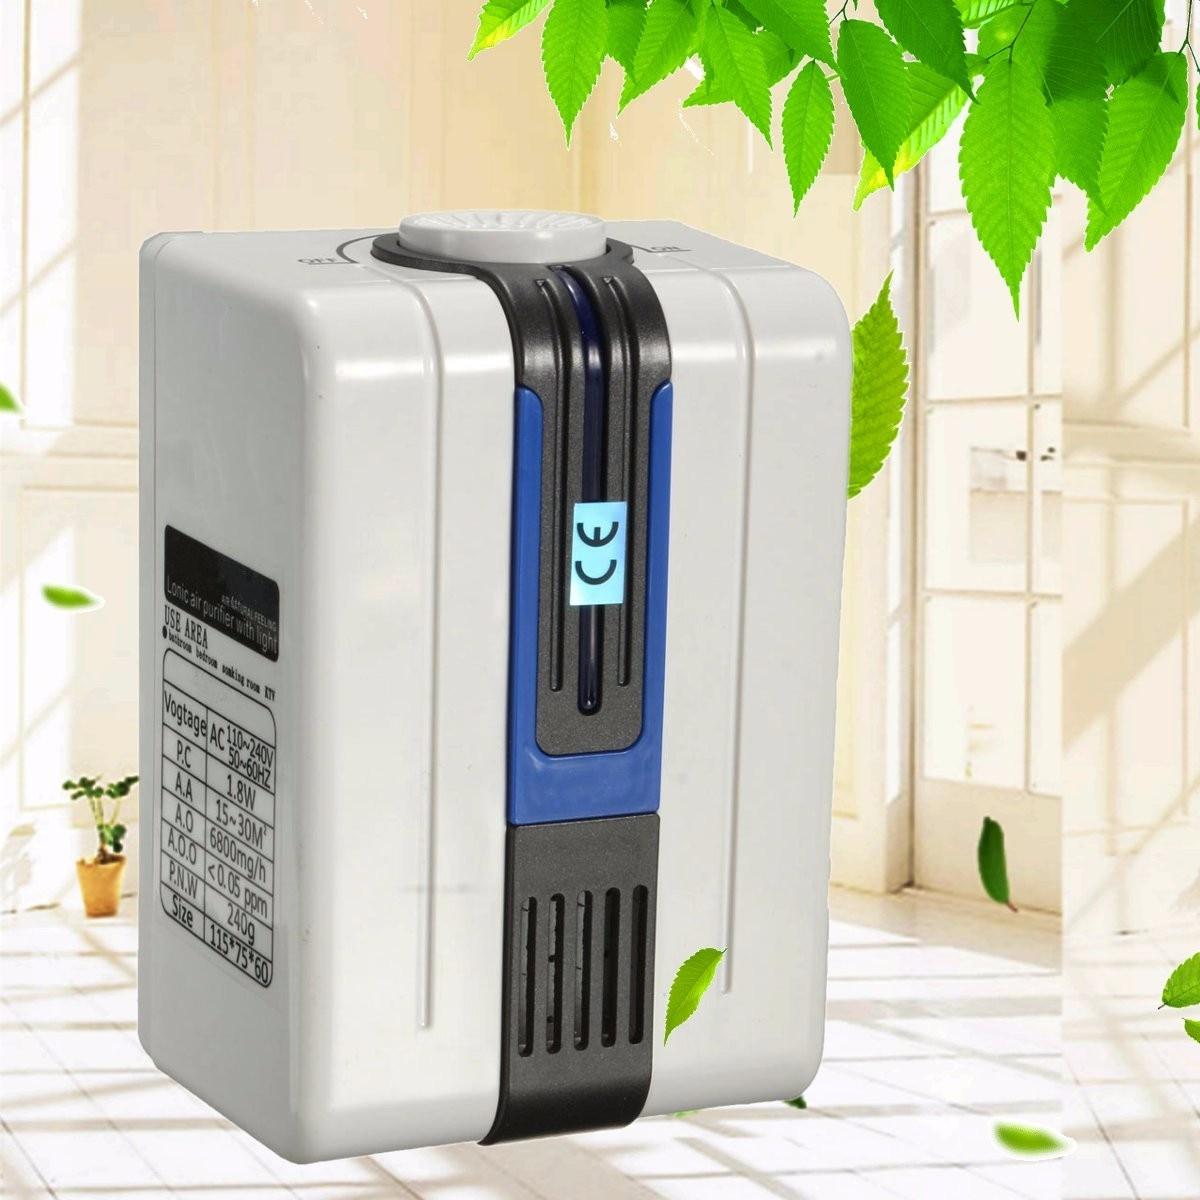 все цены на 1.8W Air Purifier for Home Negative Anion Ionizer Air Purifier Remove Formaldehyde Smoke Dust Purification pm2.5 115x75x60mm онлайн